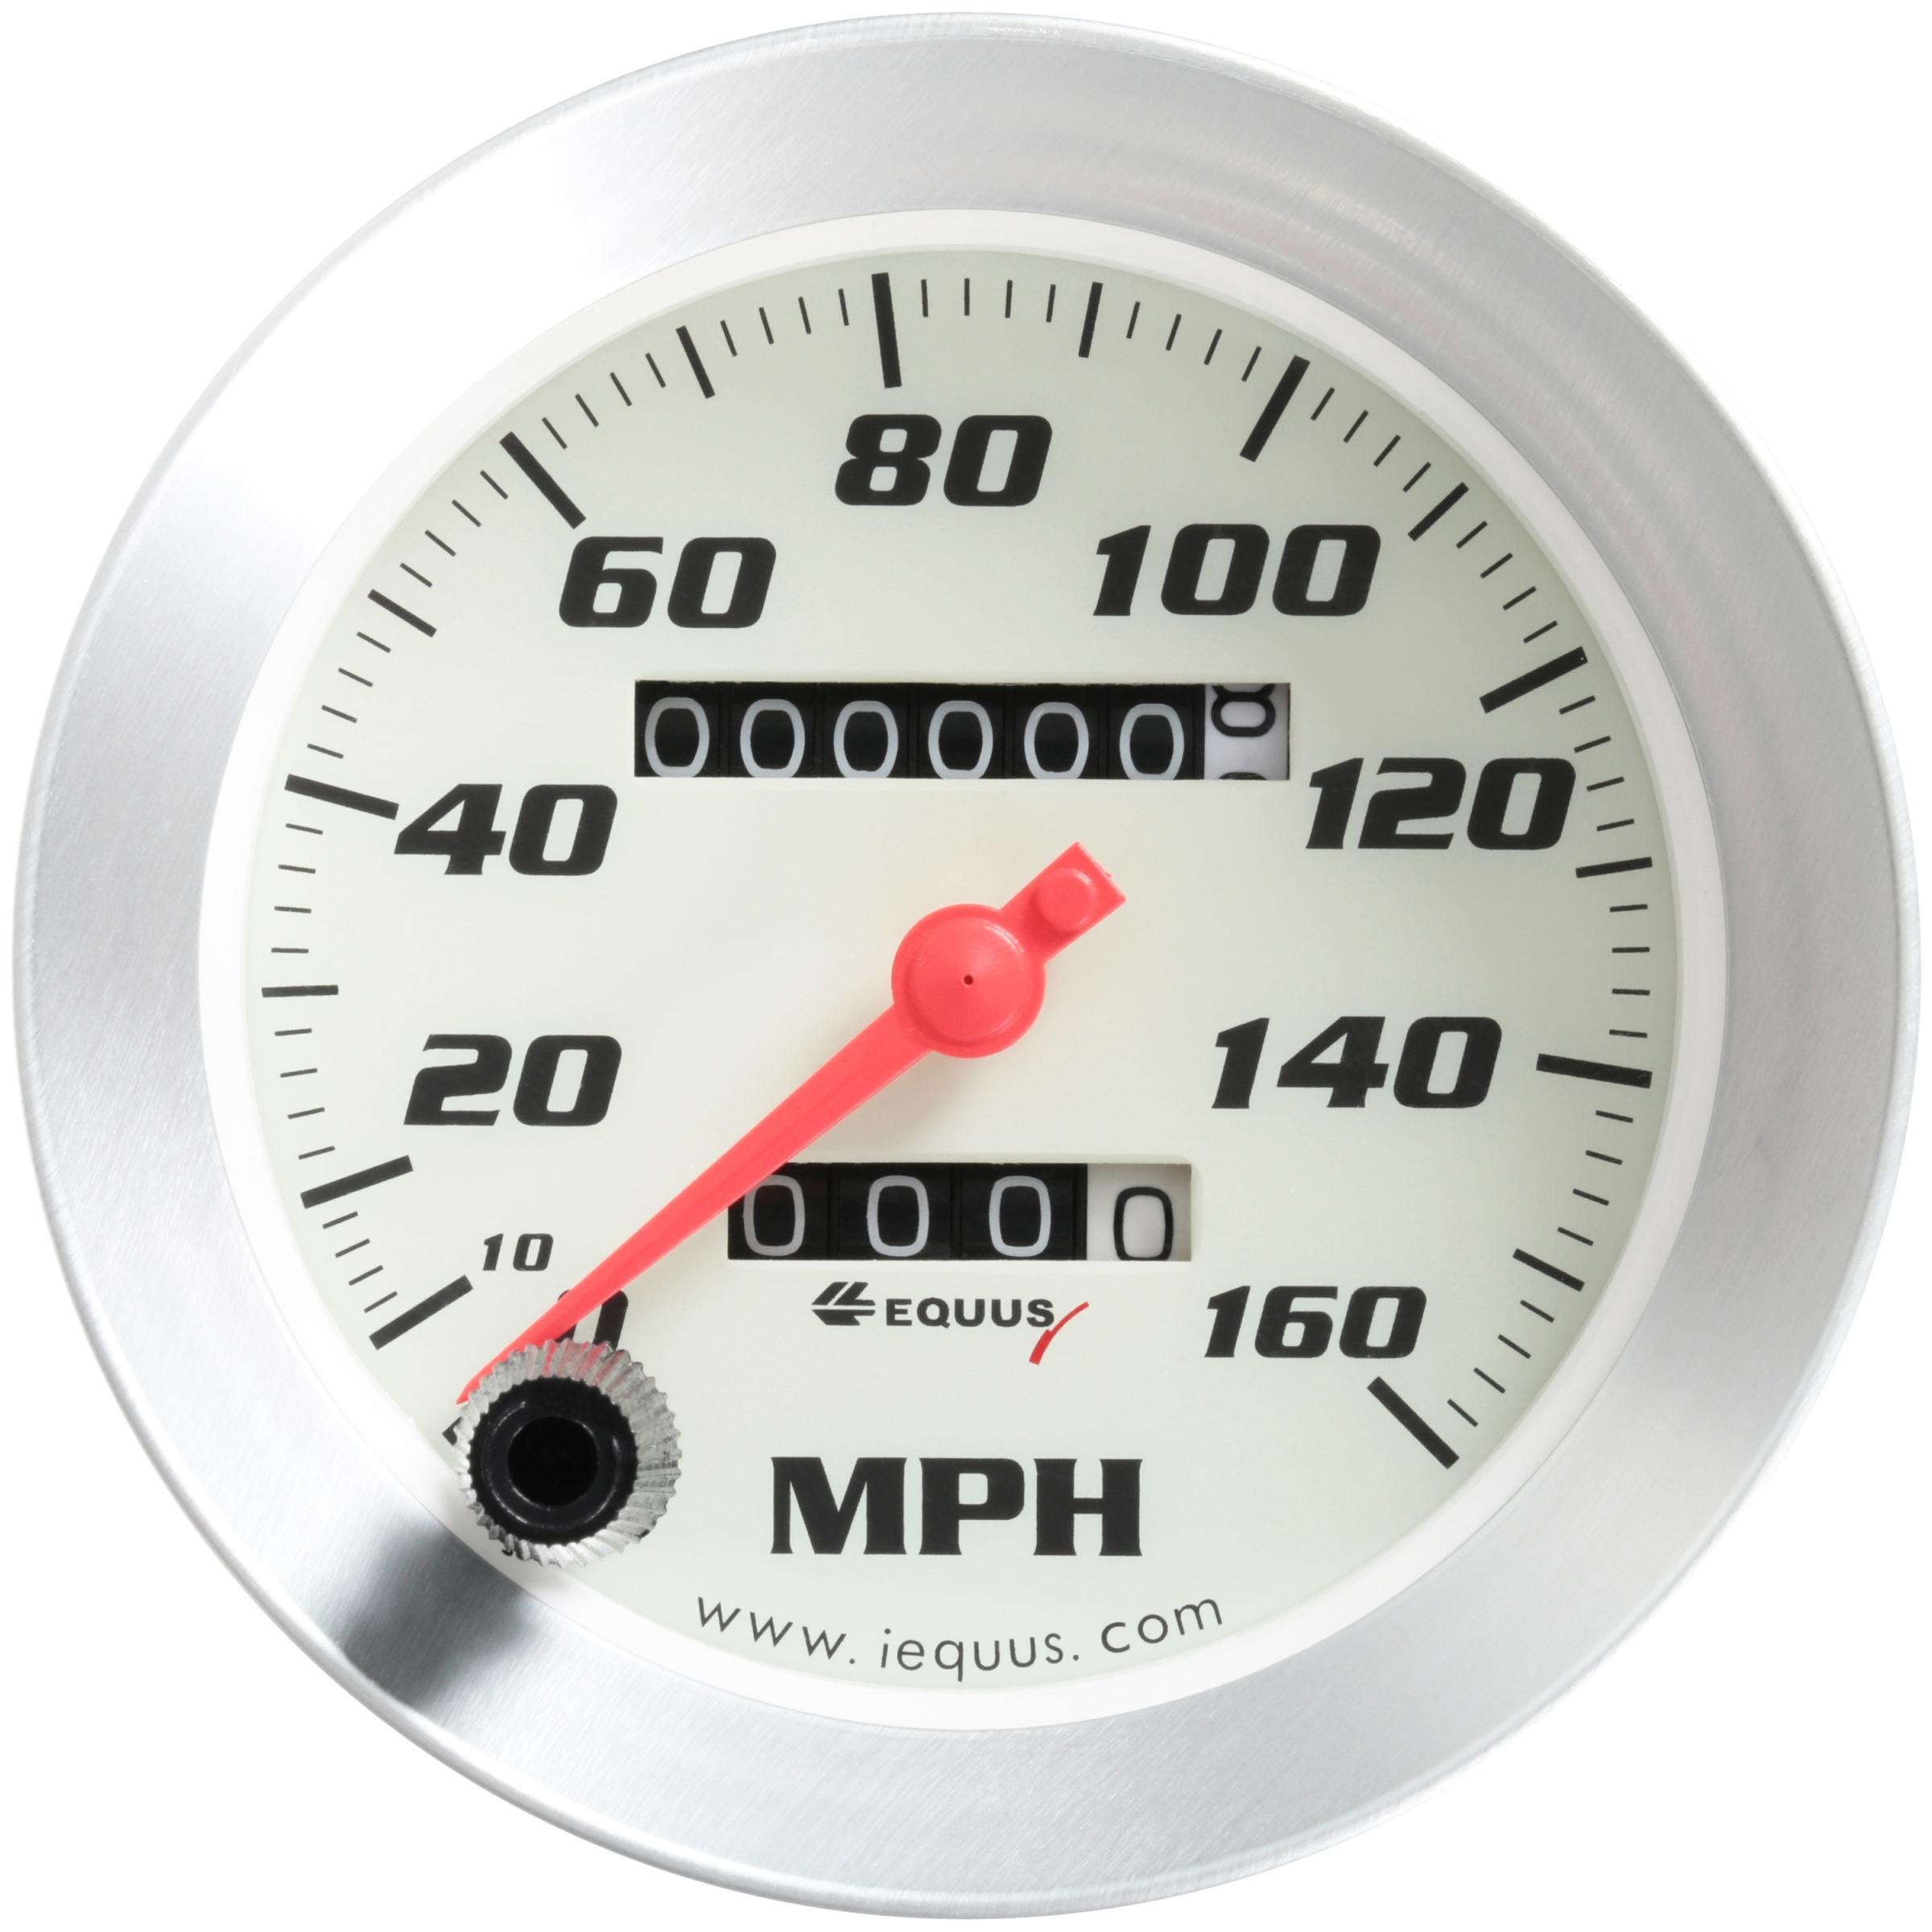 40 mph CHROME RIM NEW MONKEY BIKE PIT BIKE SPEEDO // SPEEDOMETER CLOCK